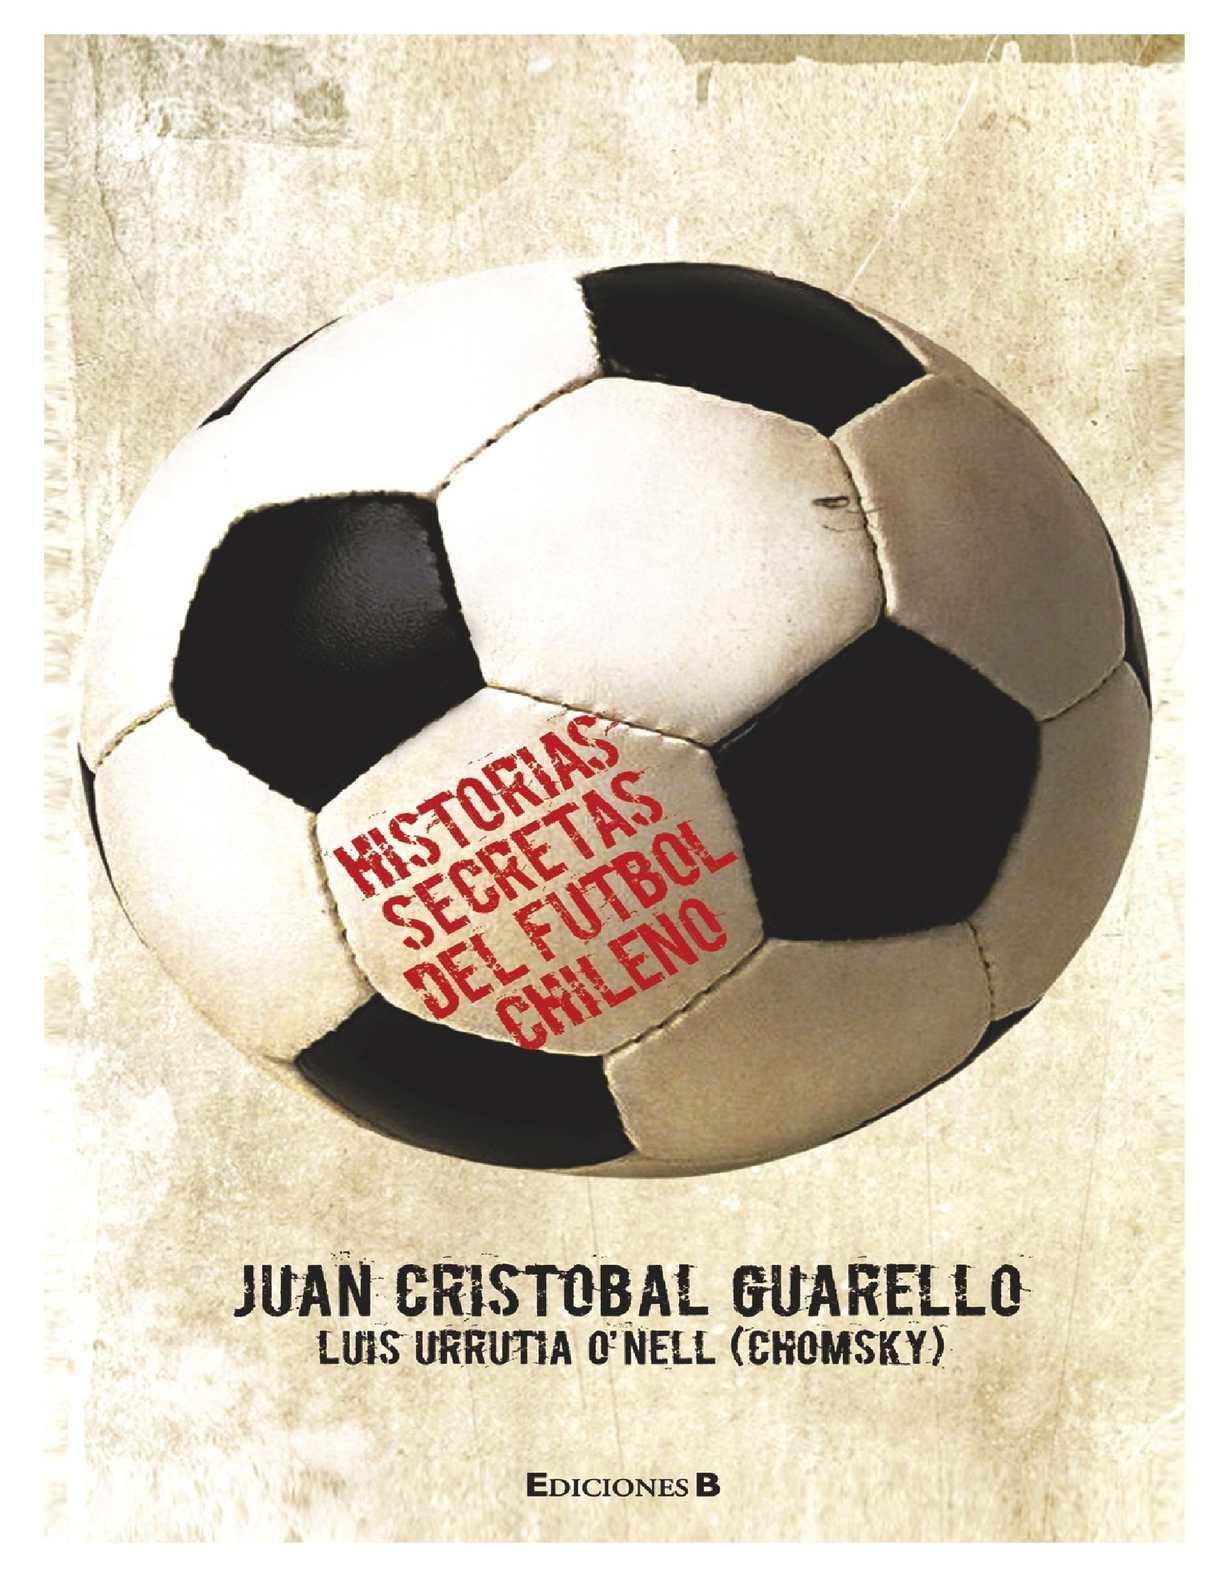 Calaméo - Historia Secretas Del Futbol Chileno I fe34a4ce59772